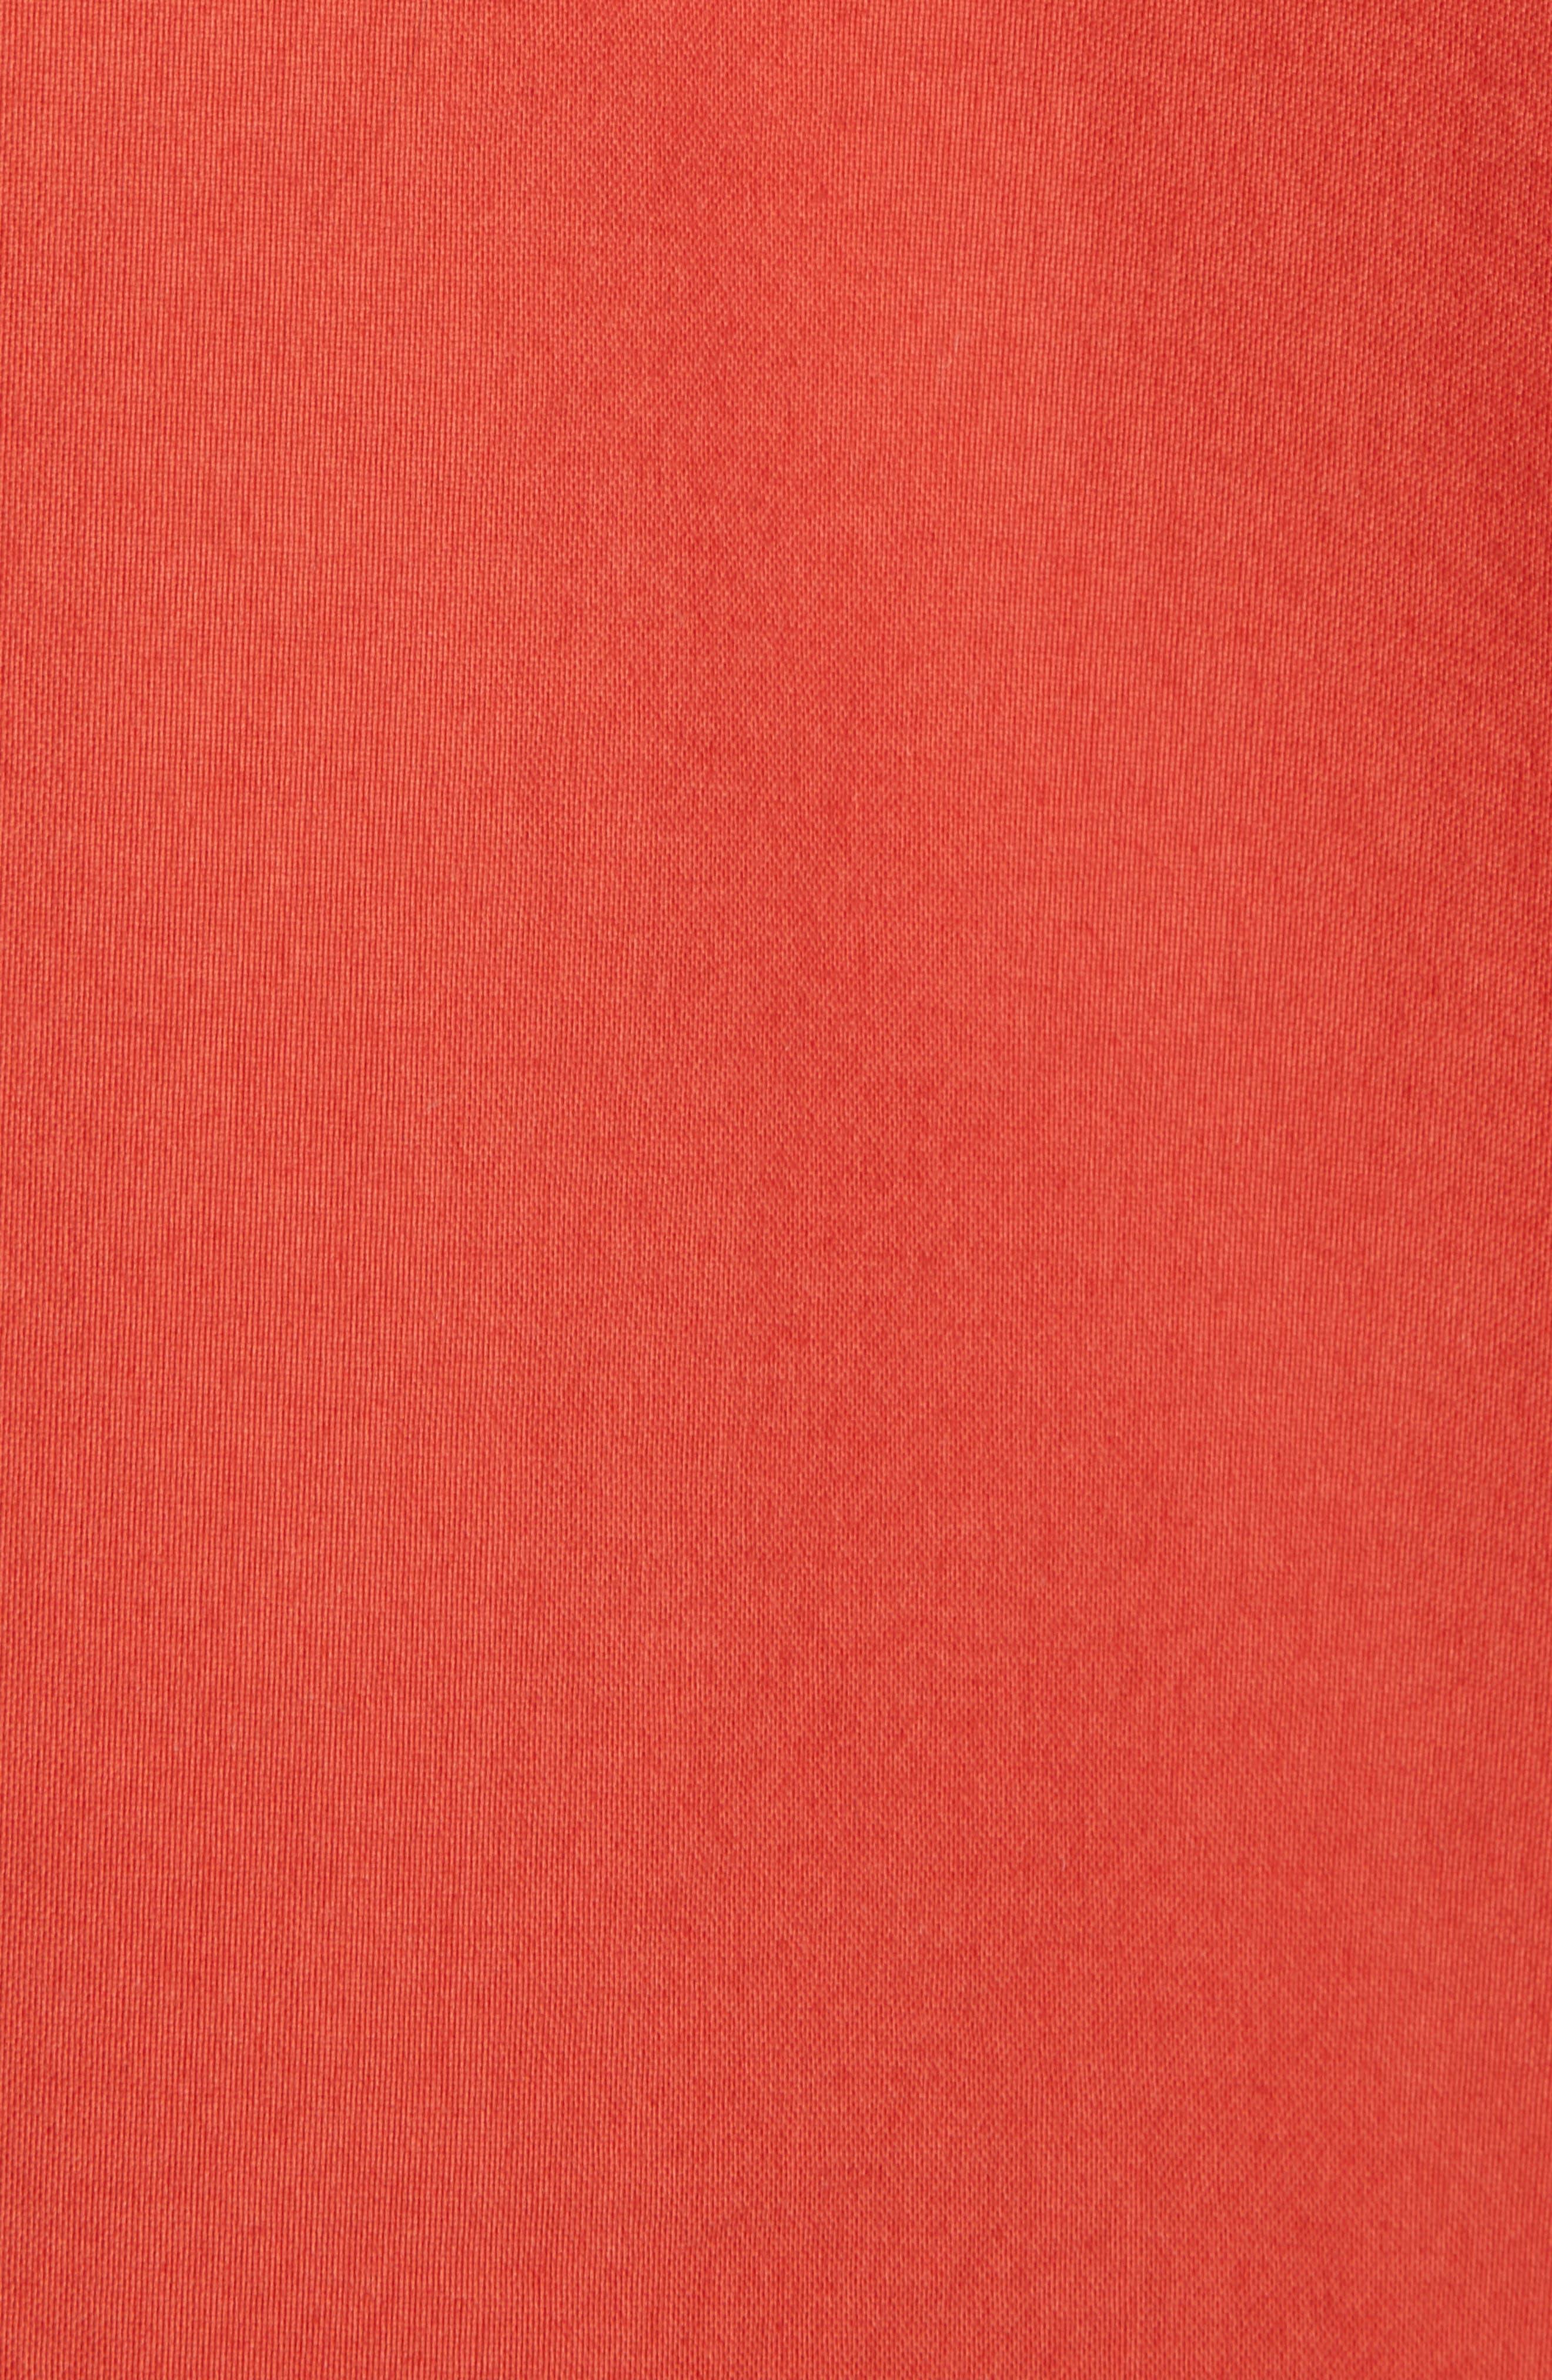 Crosby Oxford Woven Shirt,                             Alternate thumbnail 5, color,                             600